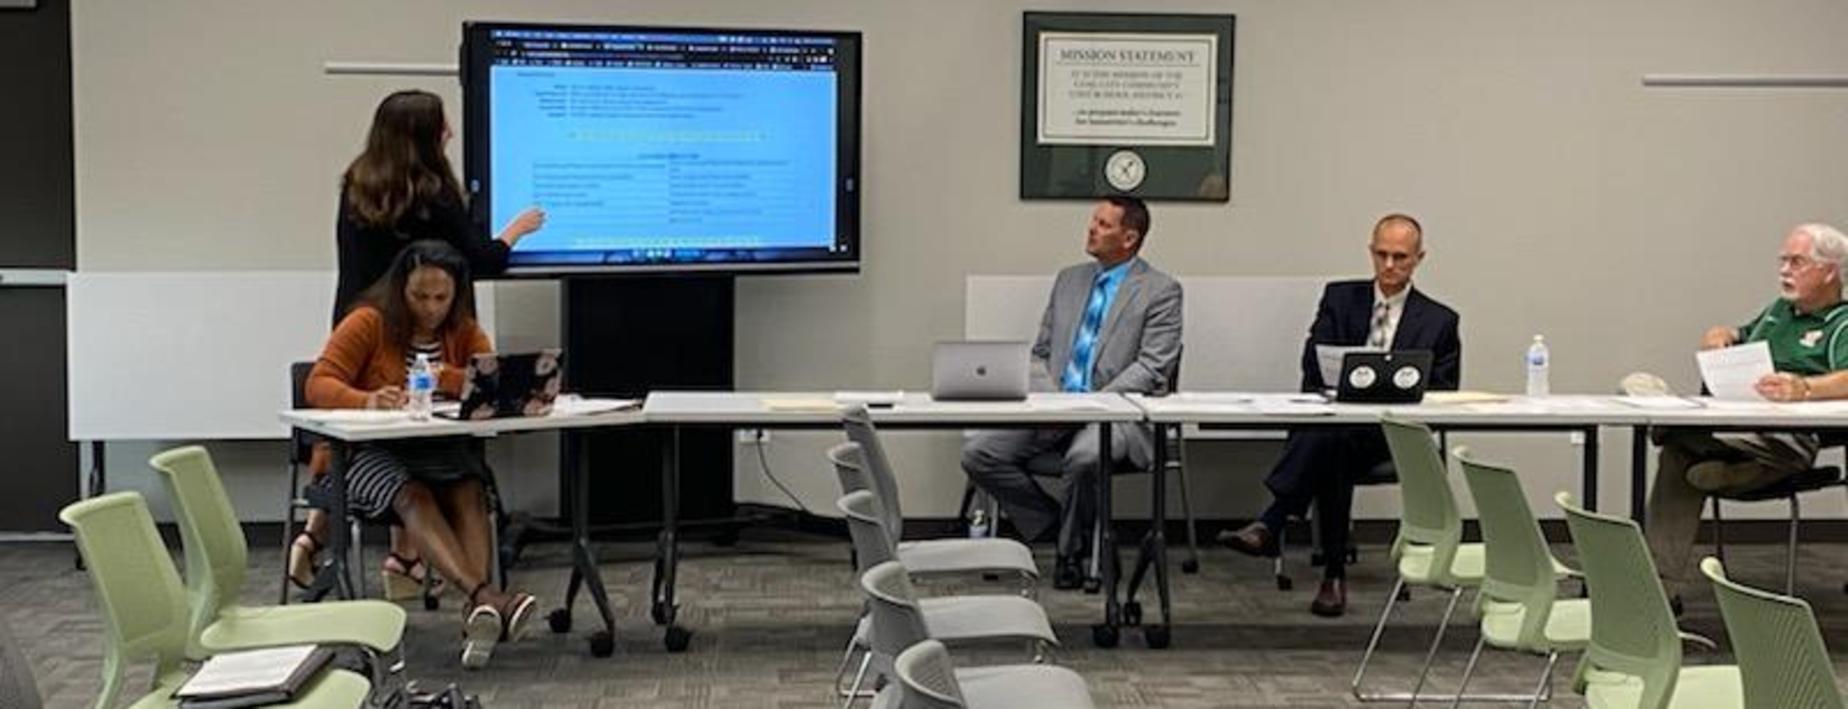 presentation to the board